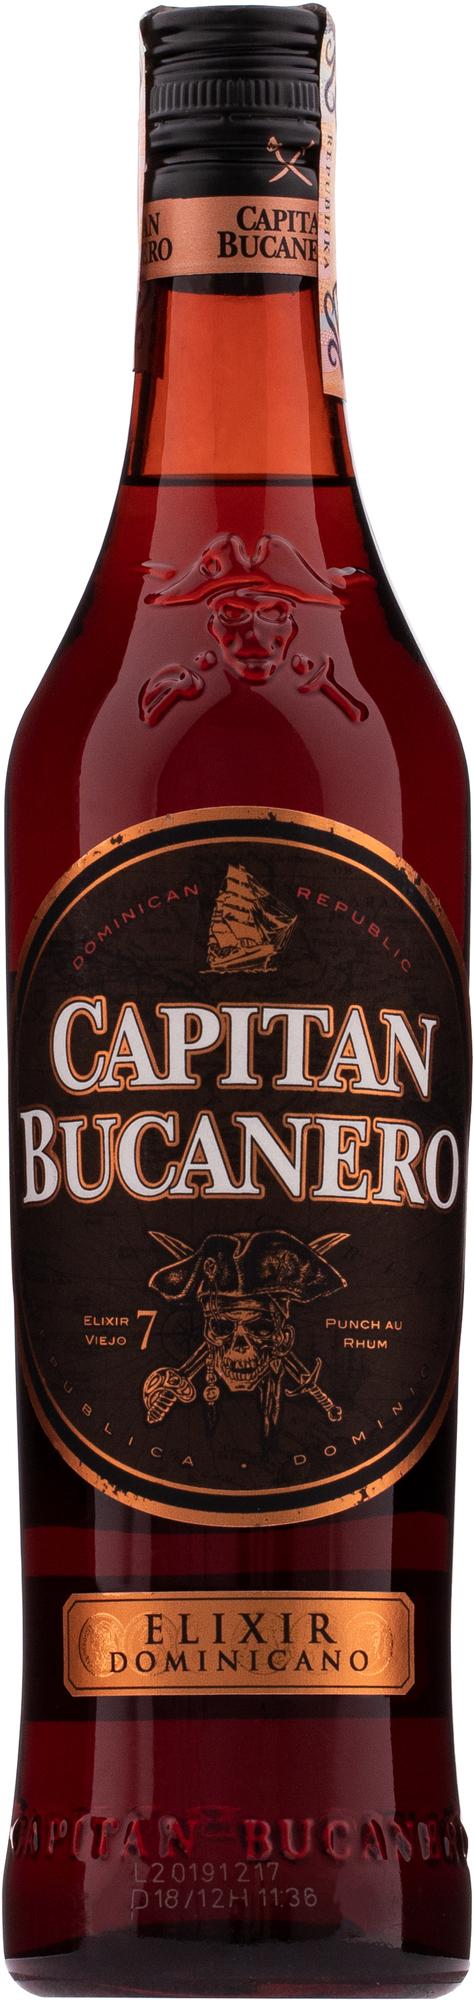 Capitan Bucanero Elixir Dominicano 0,7l